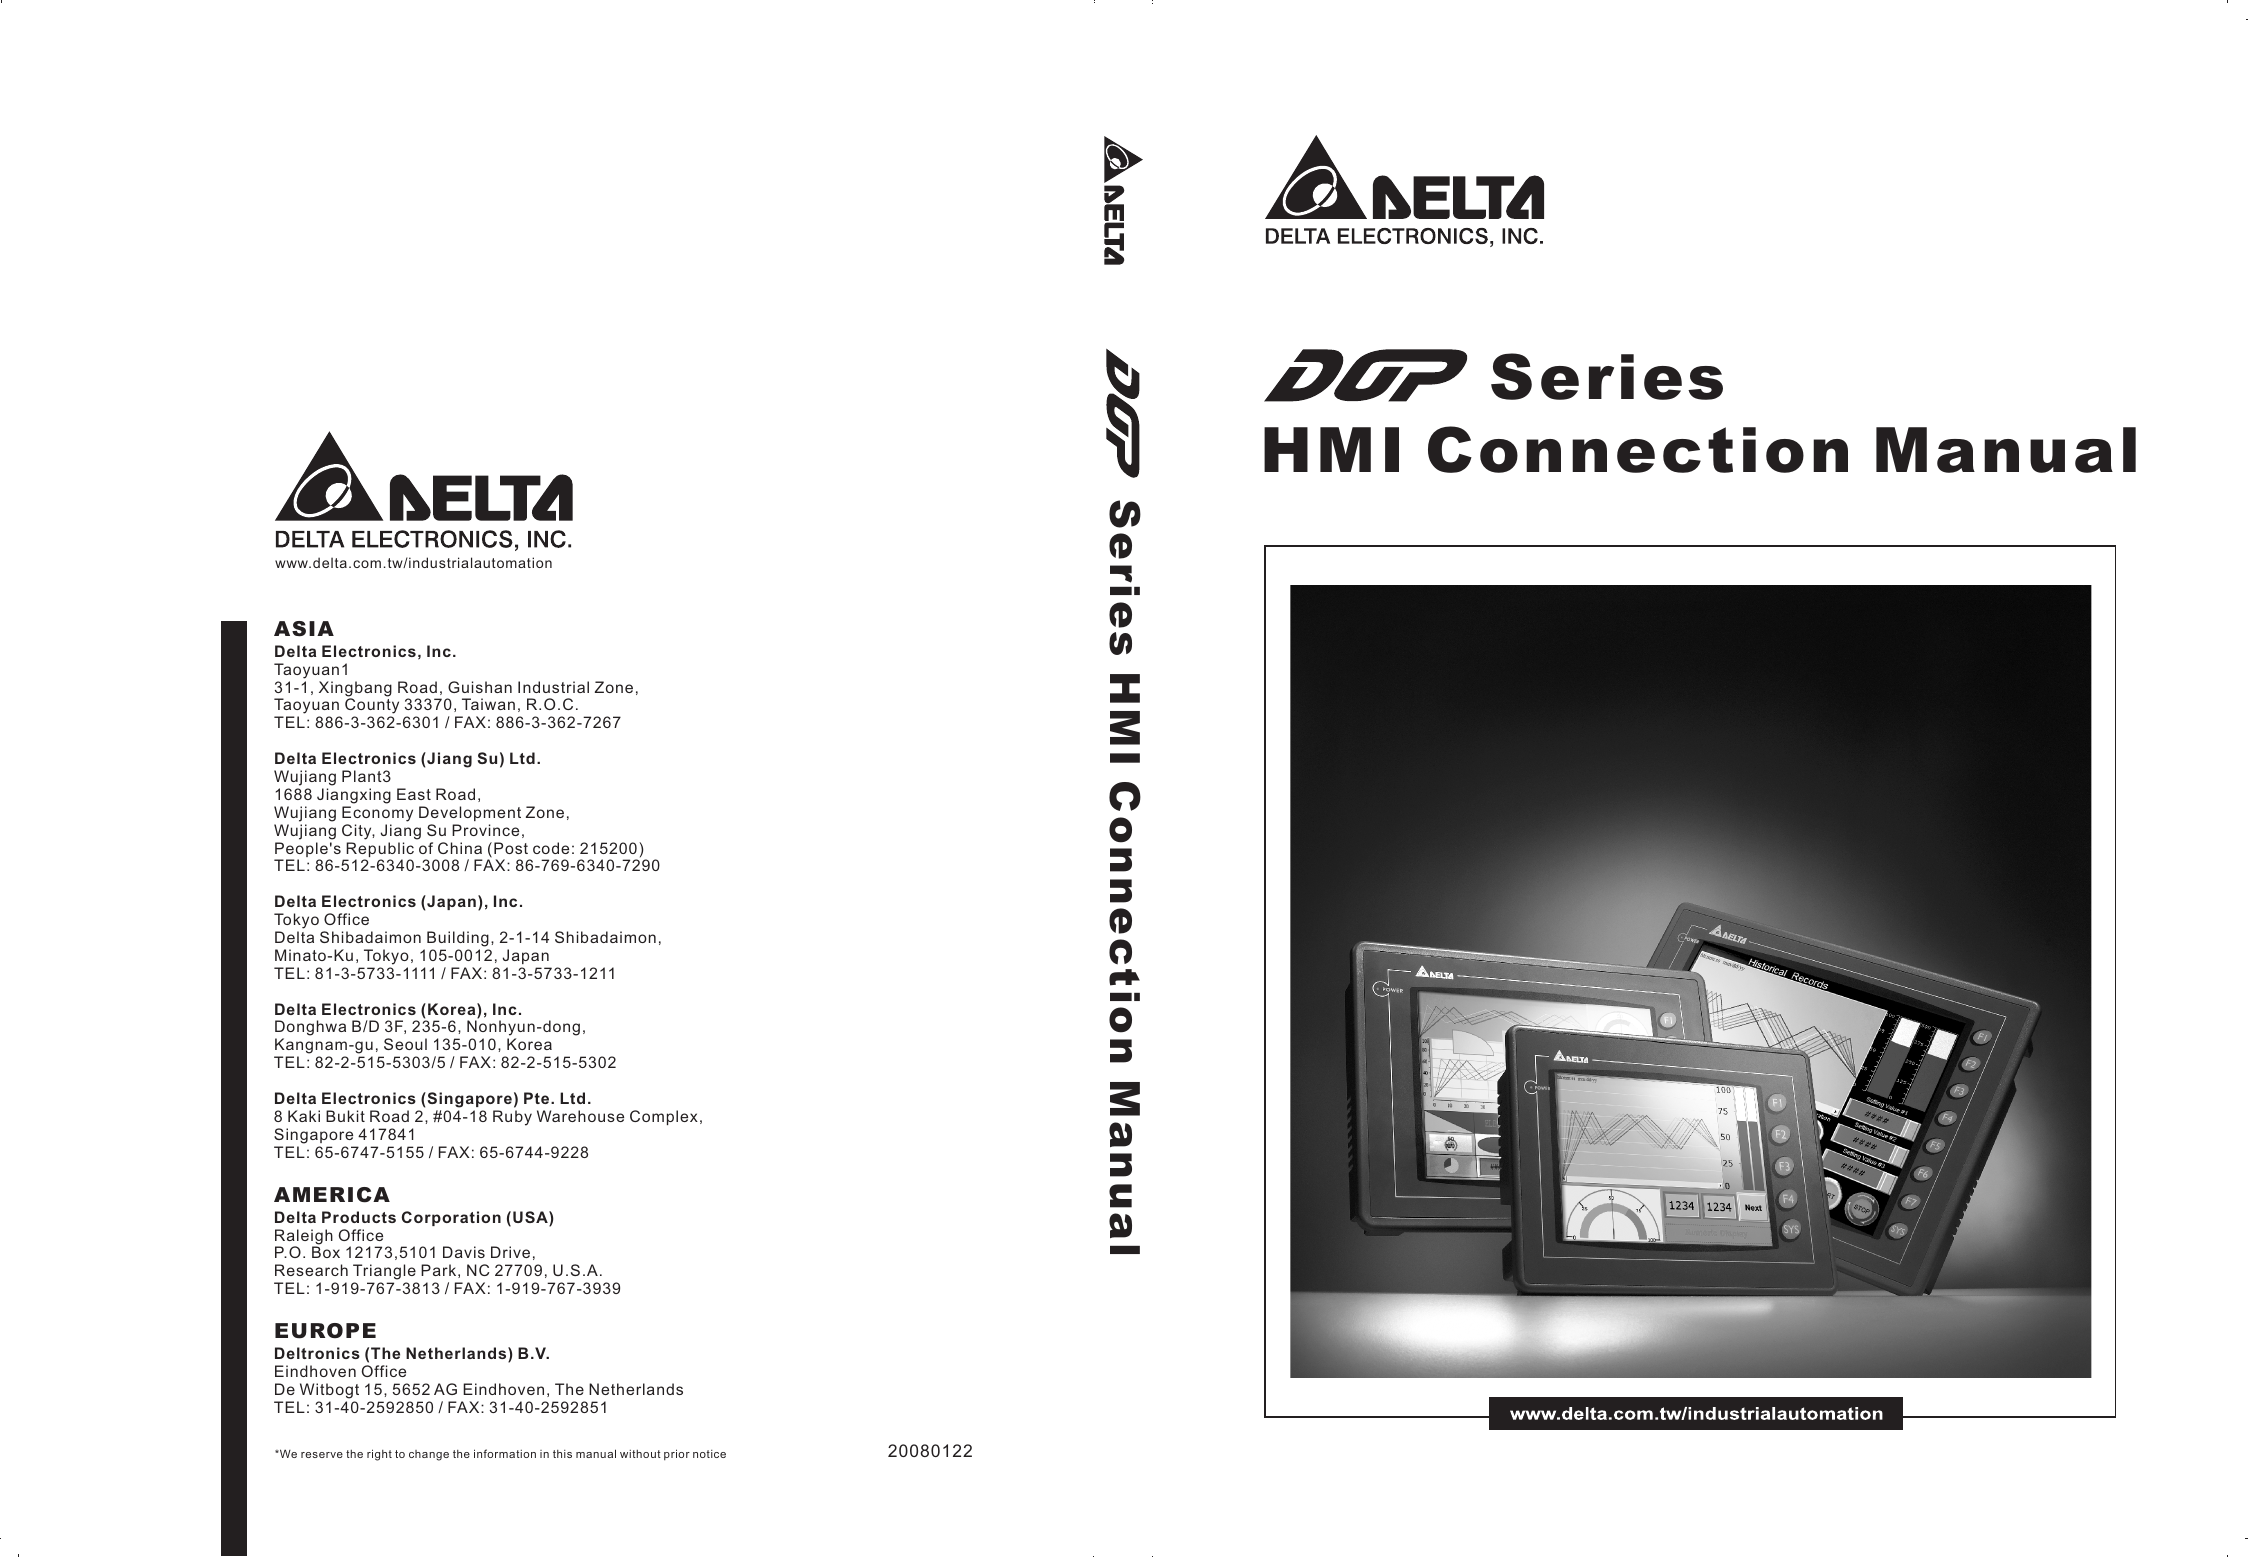 DOP Series HMI Connection Manual